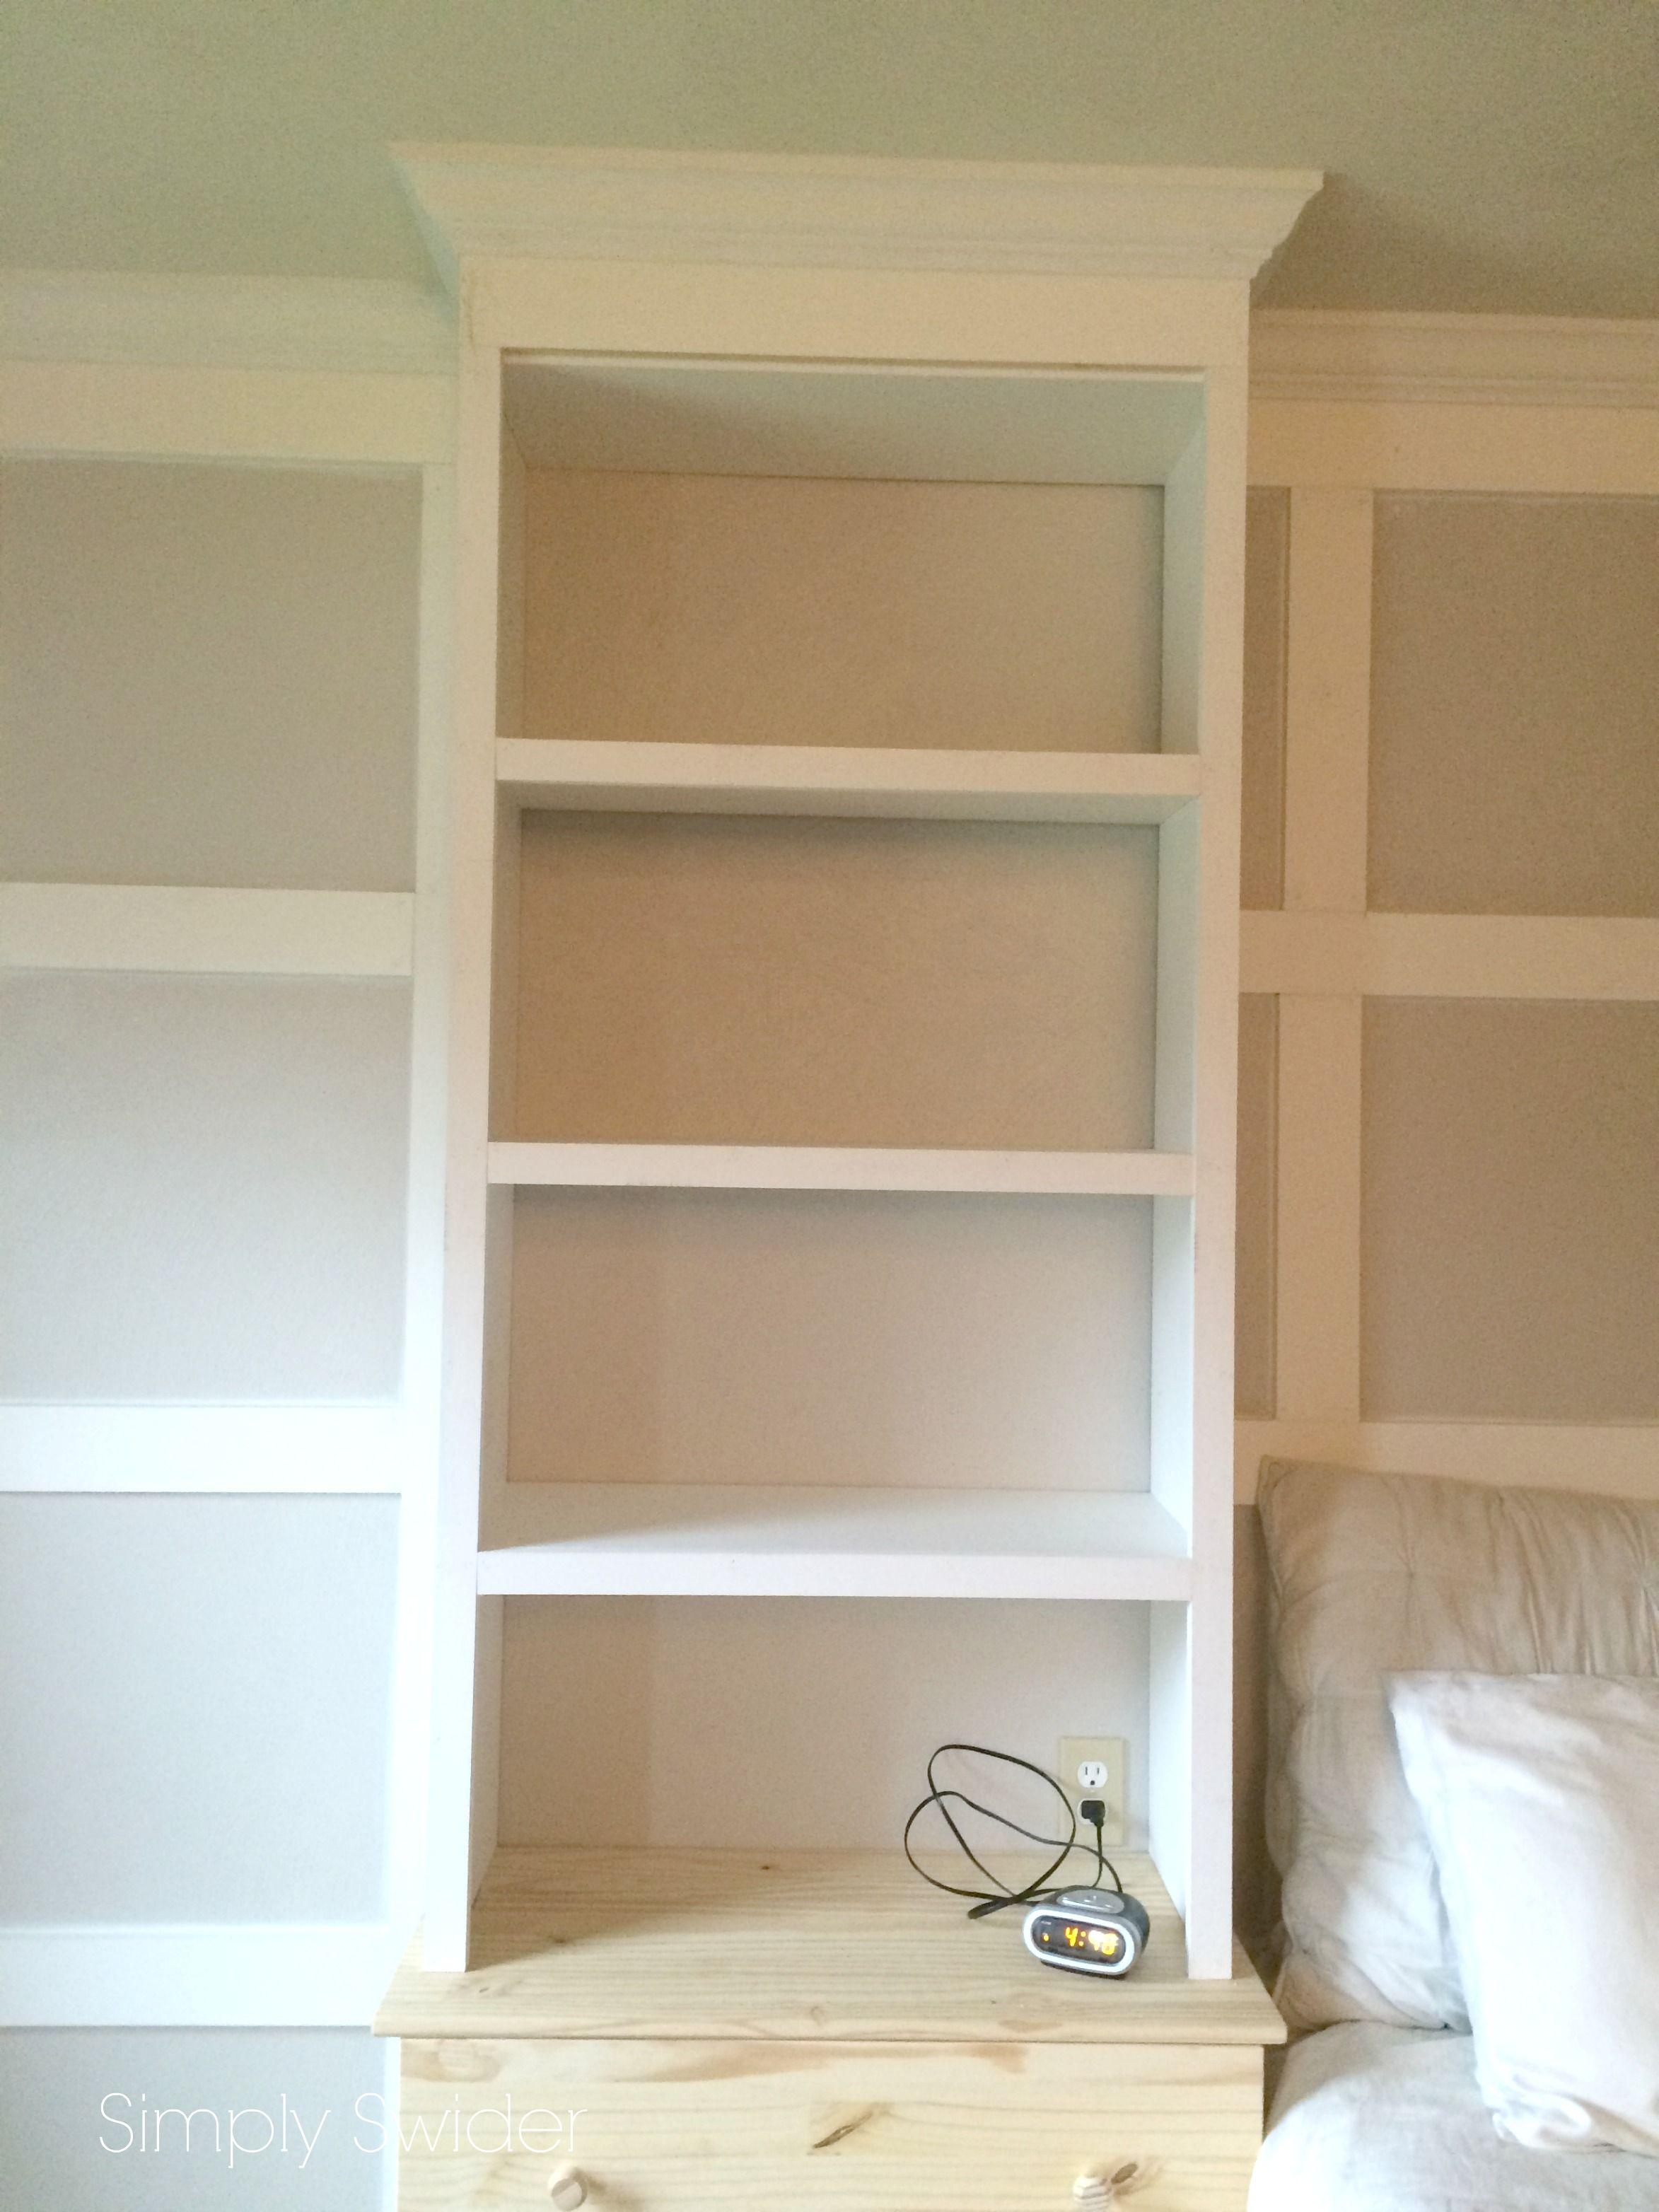 Used Ikea Dressers Minus Legs Plus Built Bookshelves On Top Small Master Bedroom Master Bedroom Closet Built In Wall Shelves